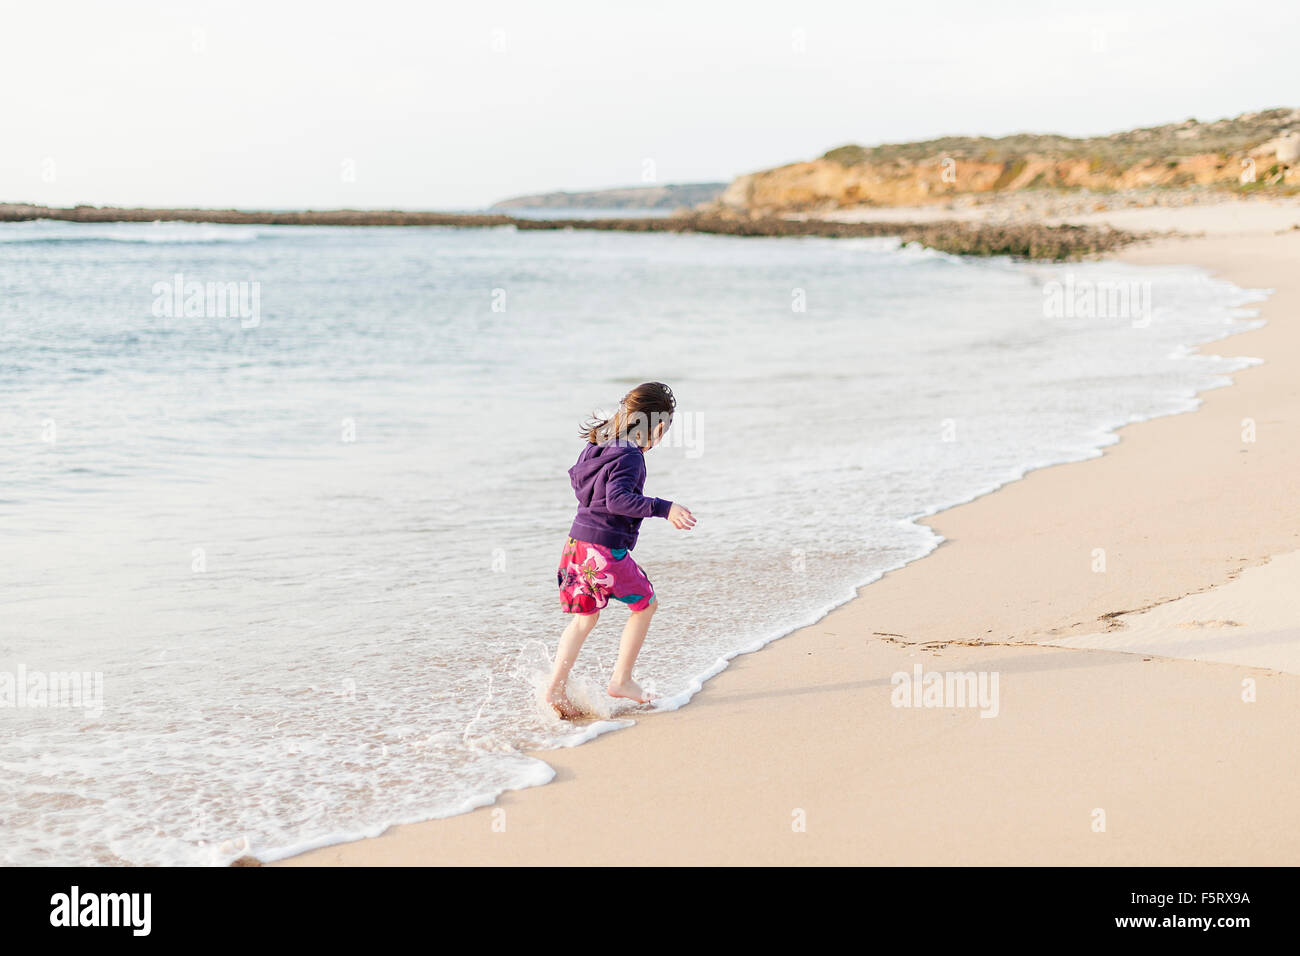 Le Portugal, l'Alentejo, Vila Nova de Milfontes, Girl (4-5) running in surf Photo Stock